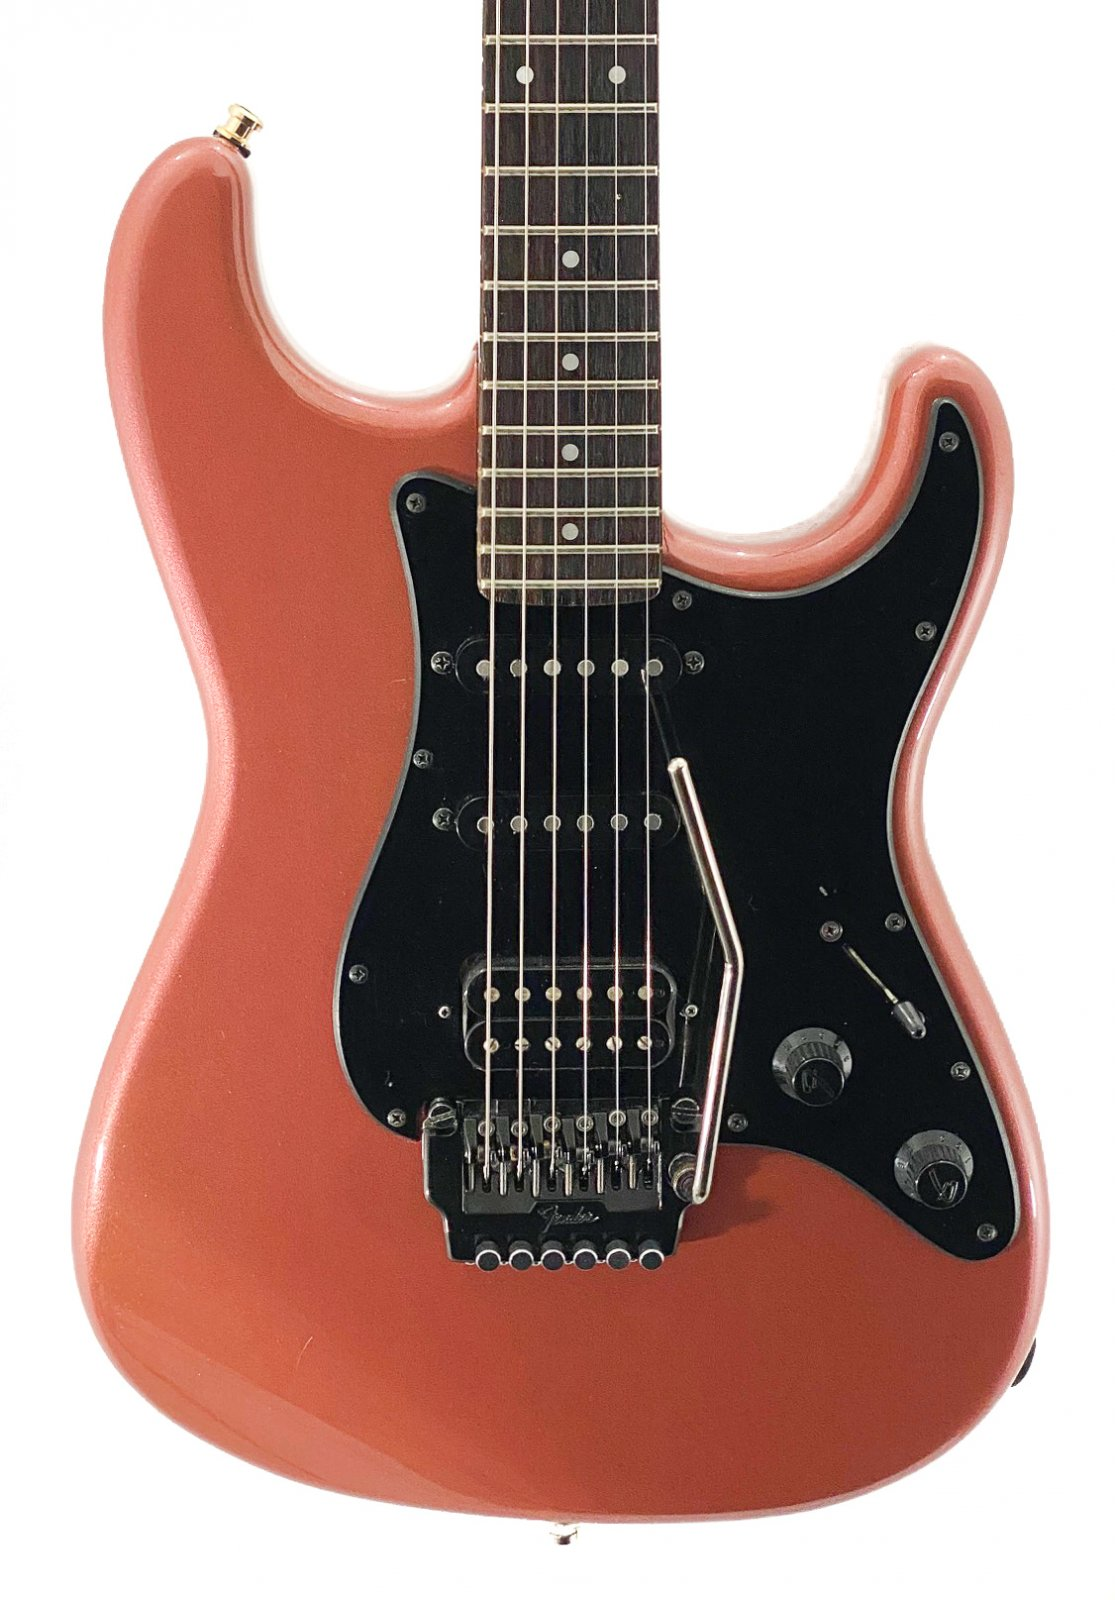 Vintage 1986 Fender Contemporary Strat Deluxe - MIJ E-series